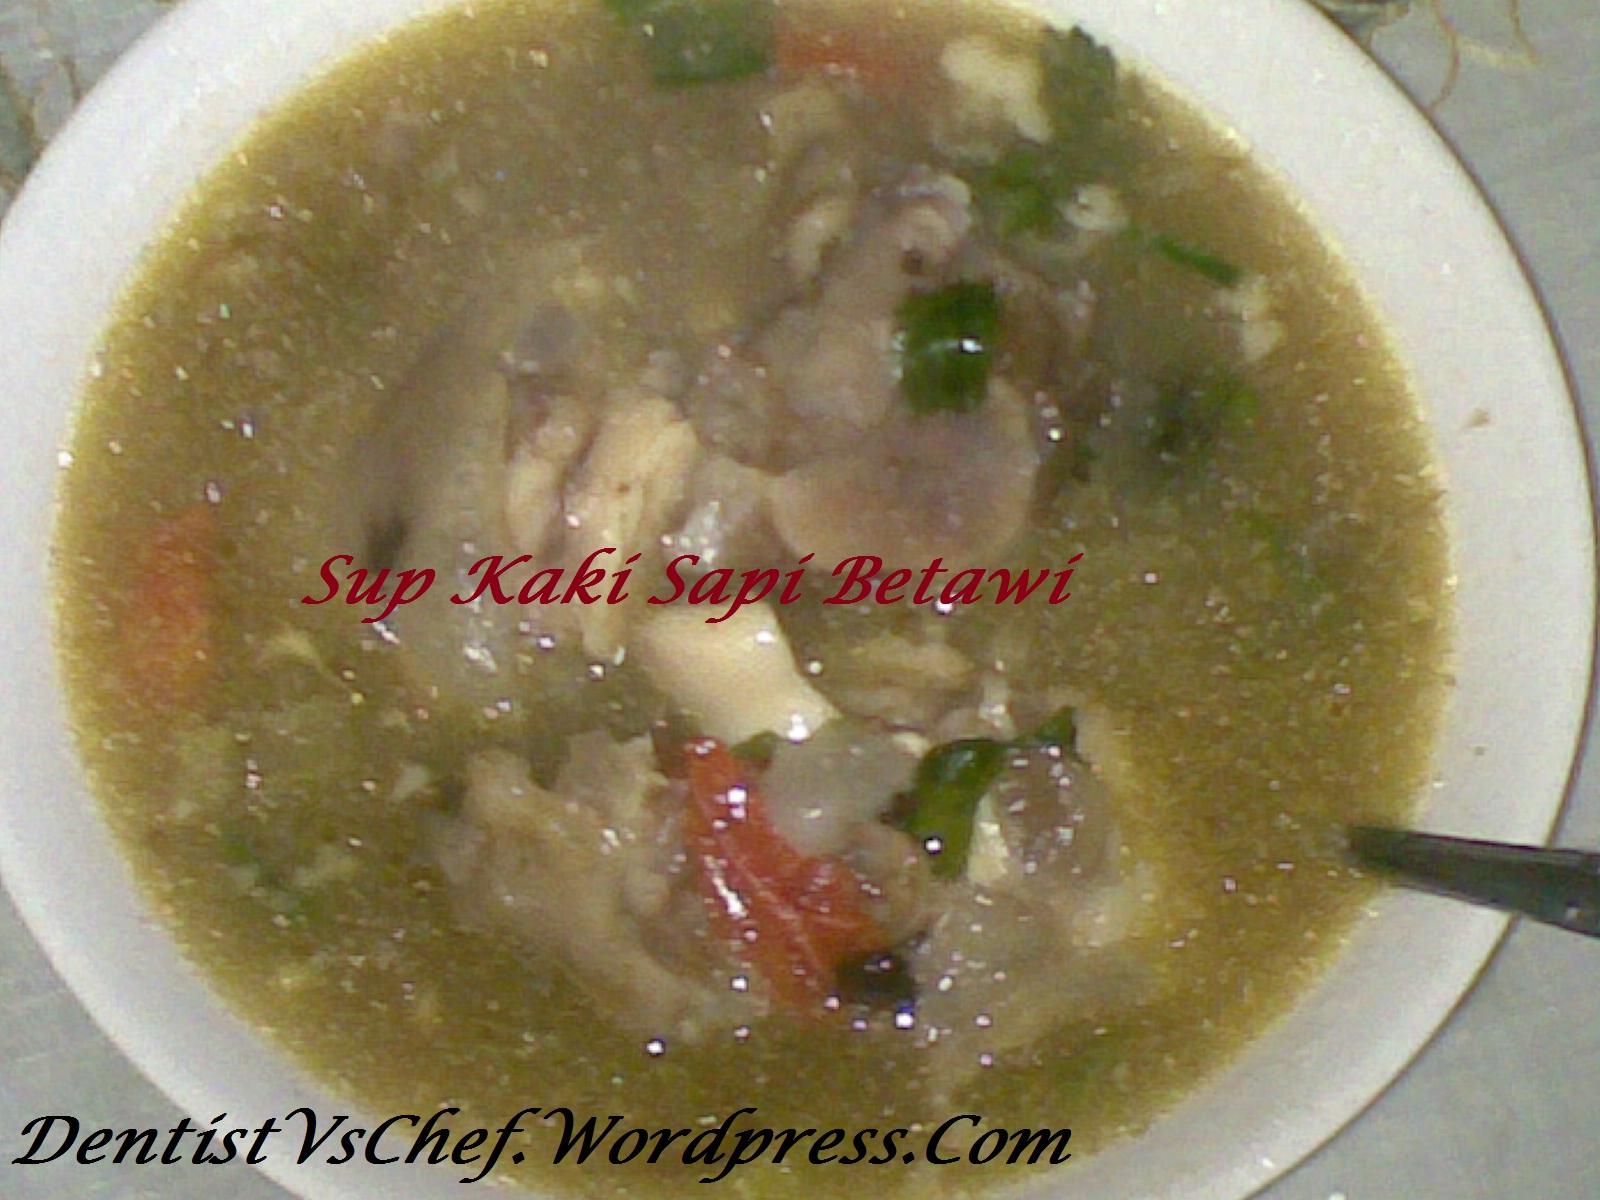 Resep Sop Kaki Sapi khas Betawi ala Dentist Chef | DENTIST CHEF